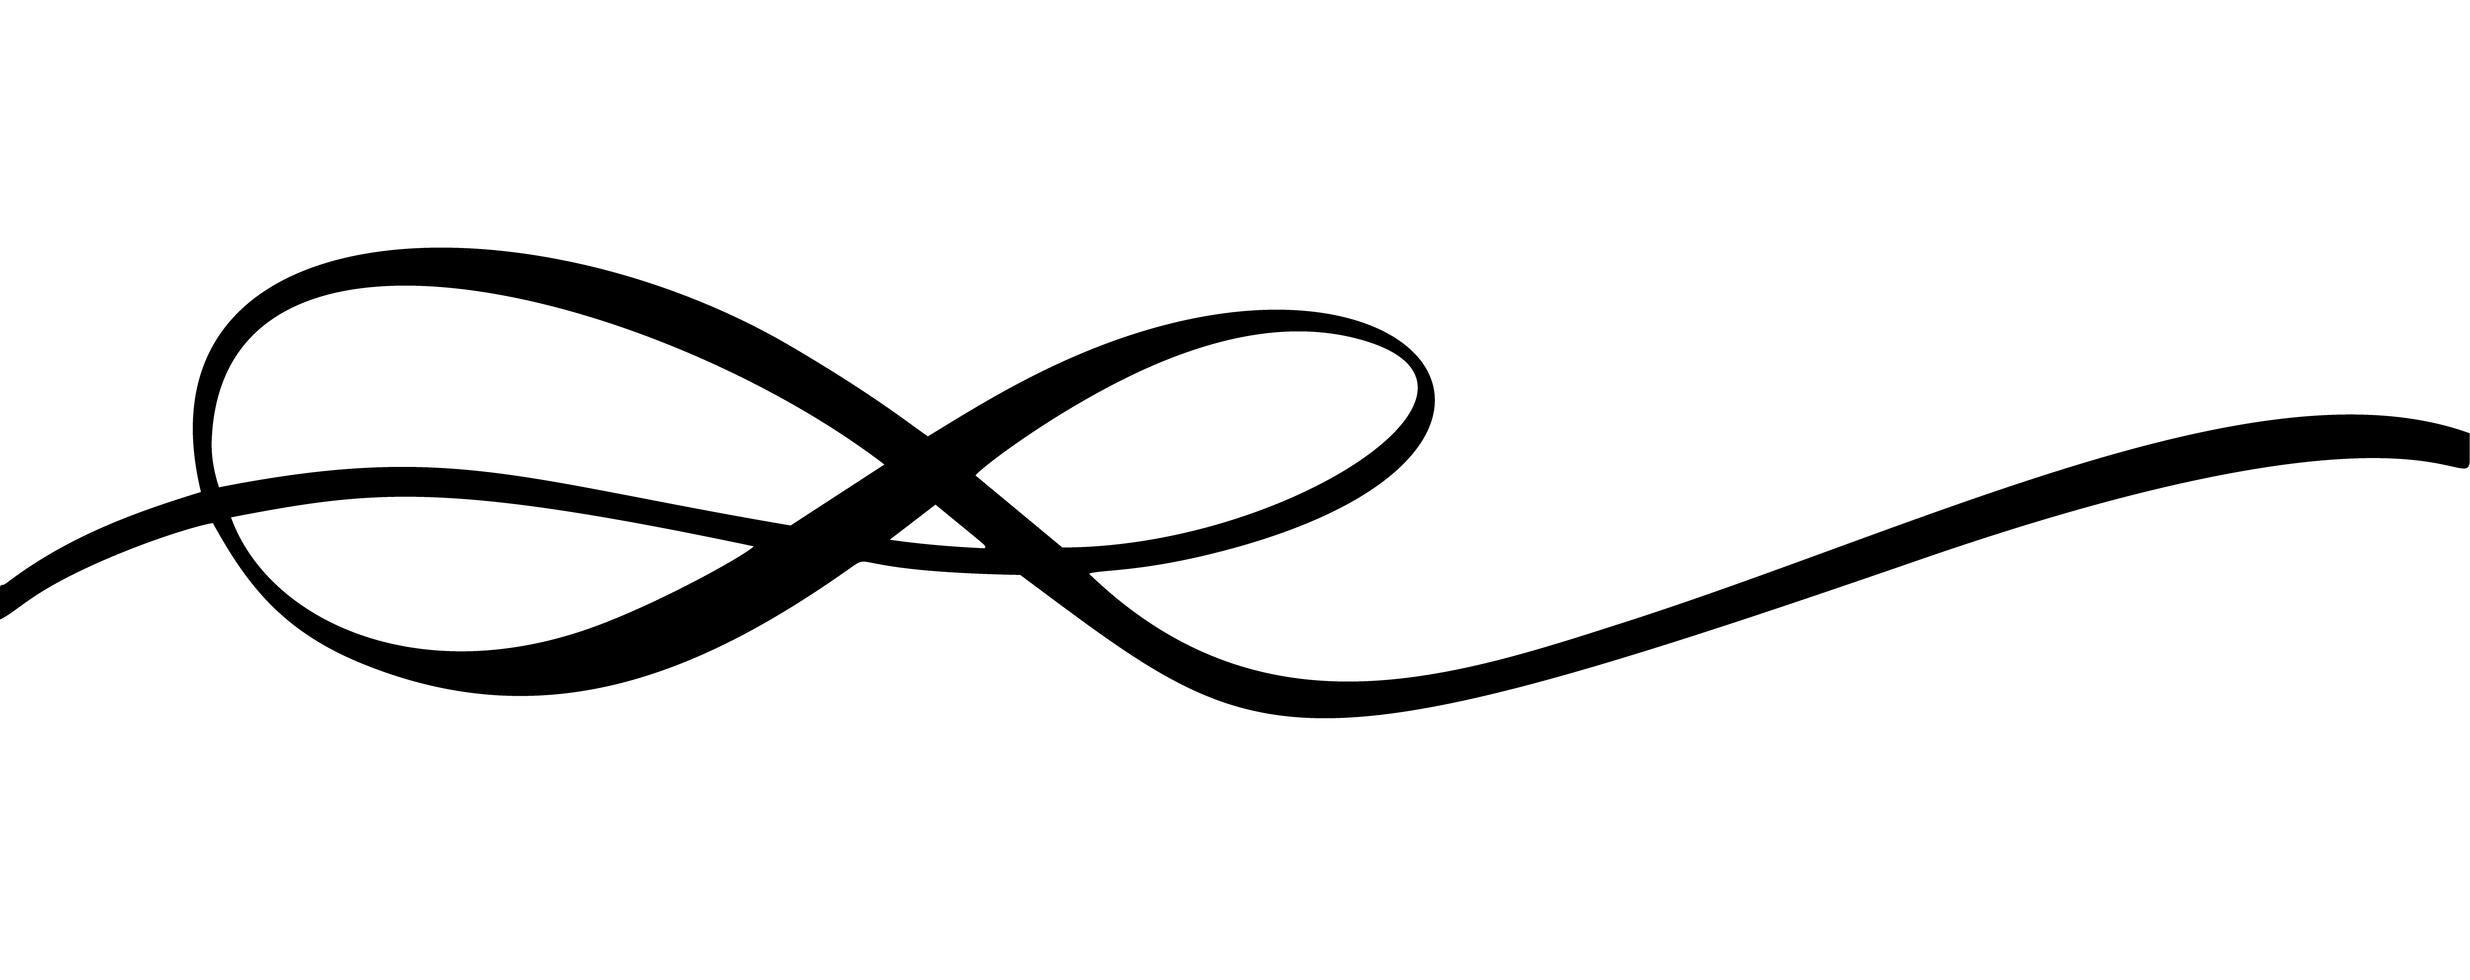 Infinity Calligraphy Vector Illustration Symbol Eternal Limitless Emblem Black Mobius Ribbon Silho Infinity Tattoo Designs Graphic Design Logo Graphic Design